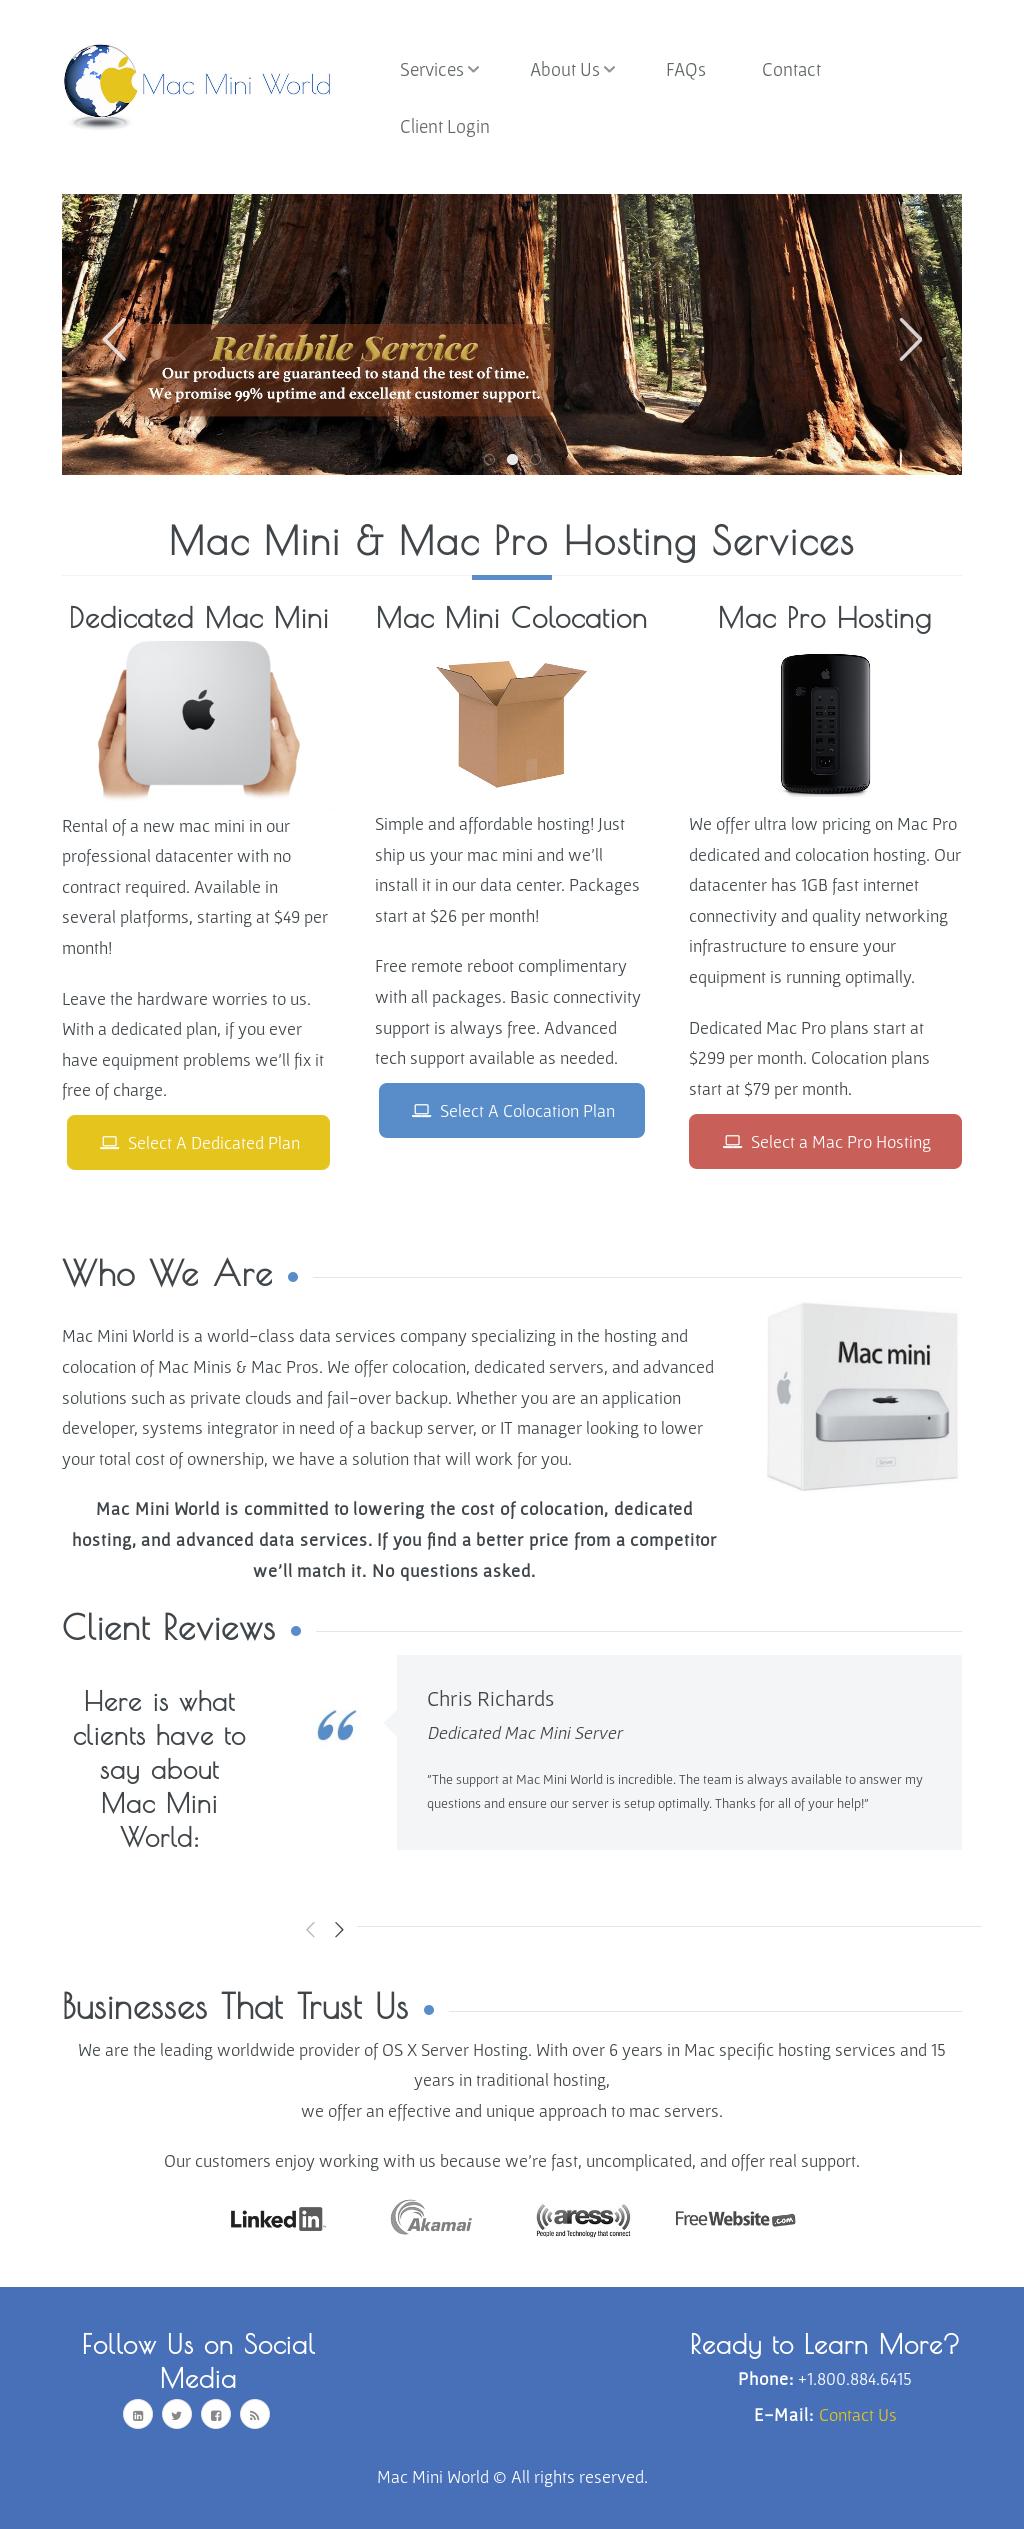 Mac Mini World Competitors, Revenue and Employees - Owler